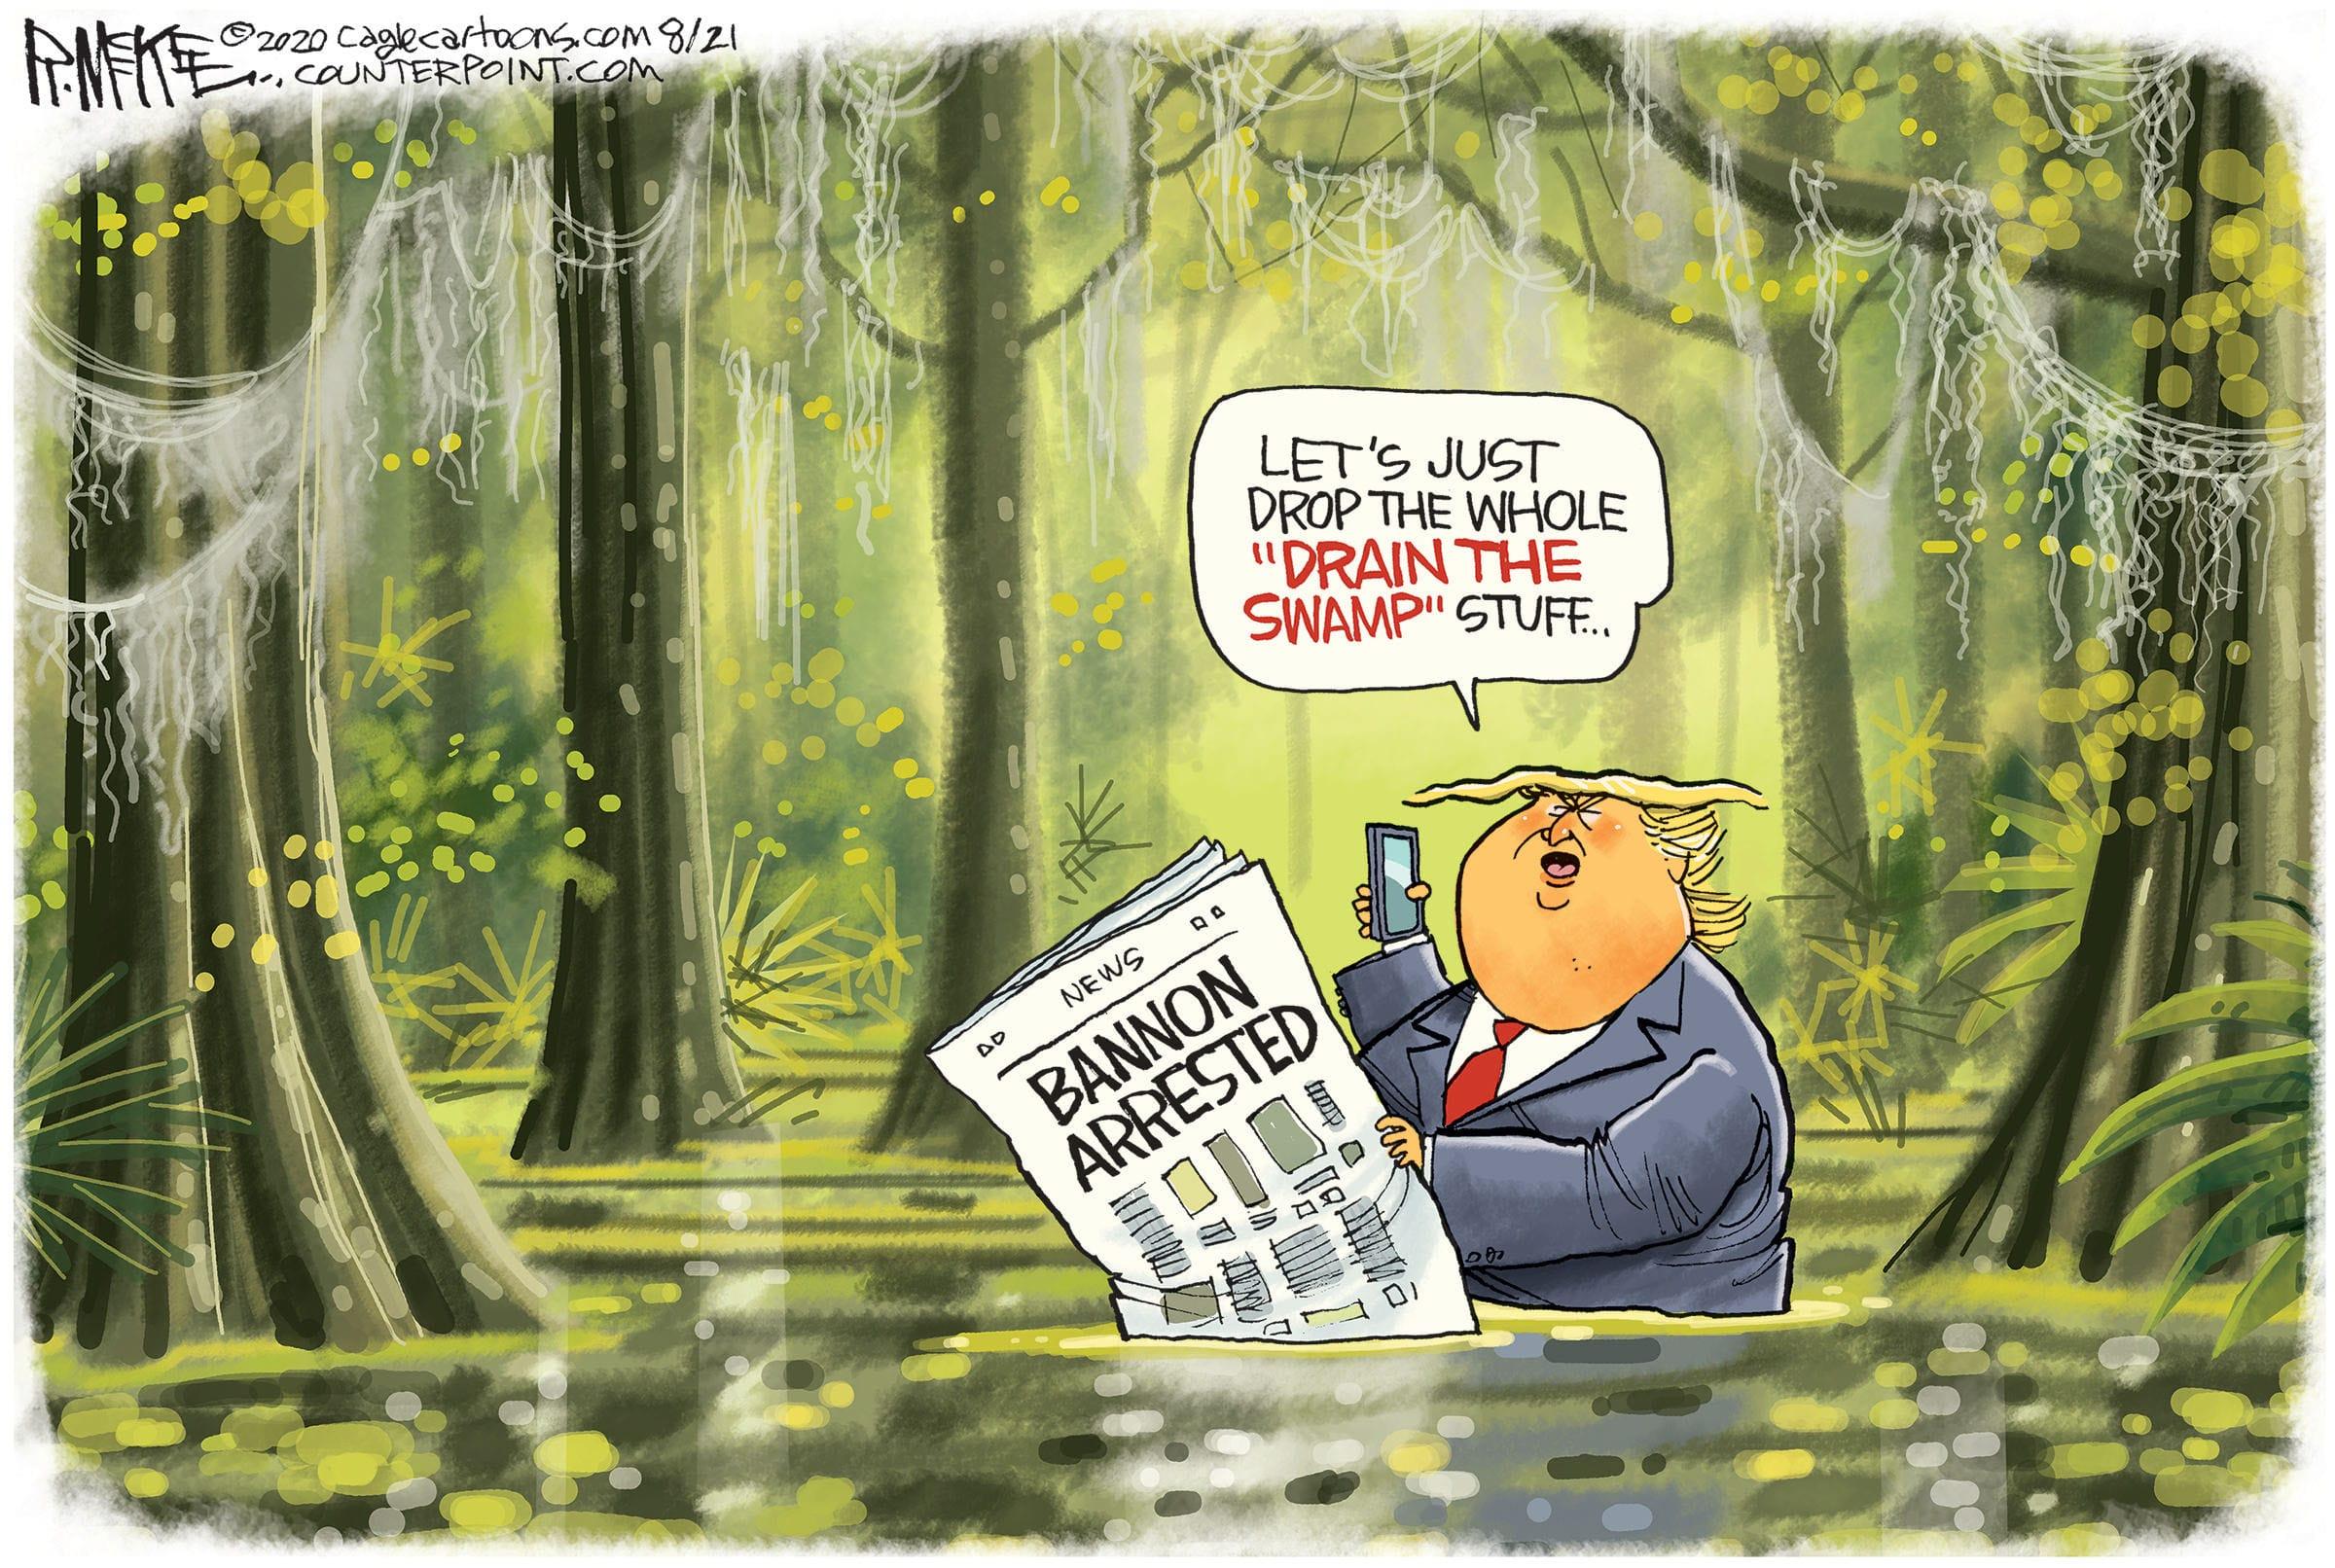 Aug. 22: Drain The Swamp